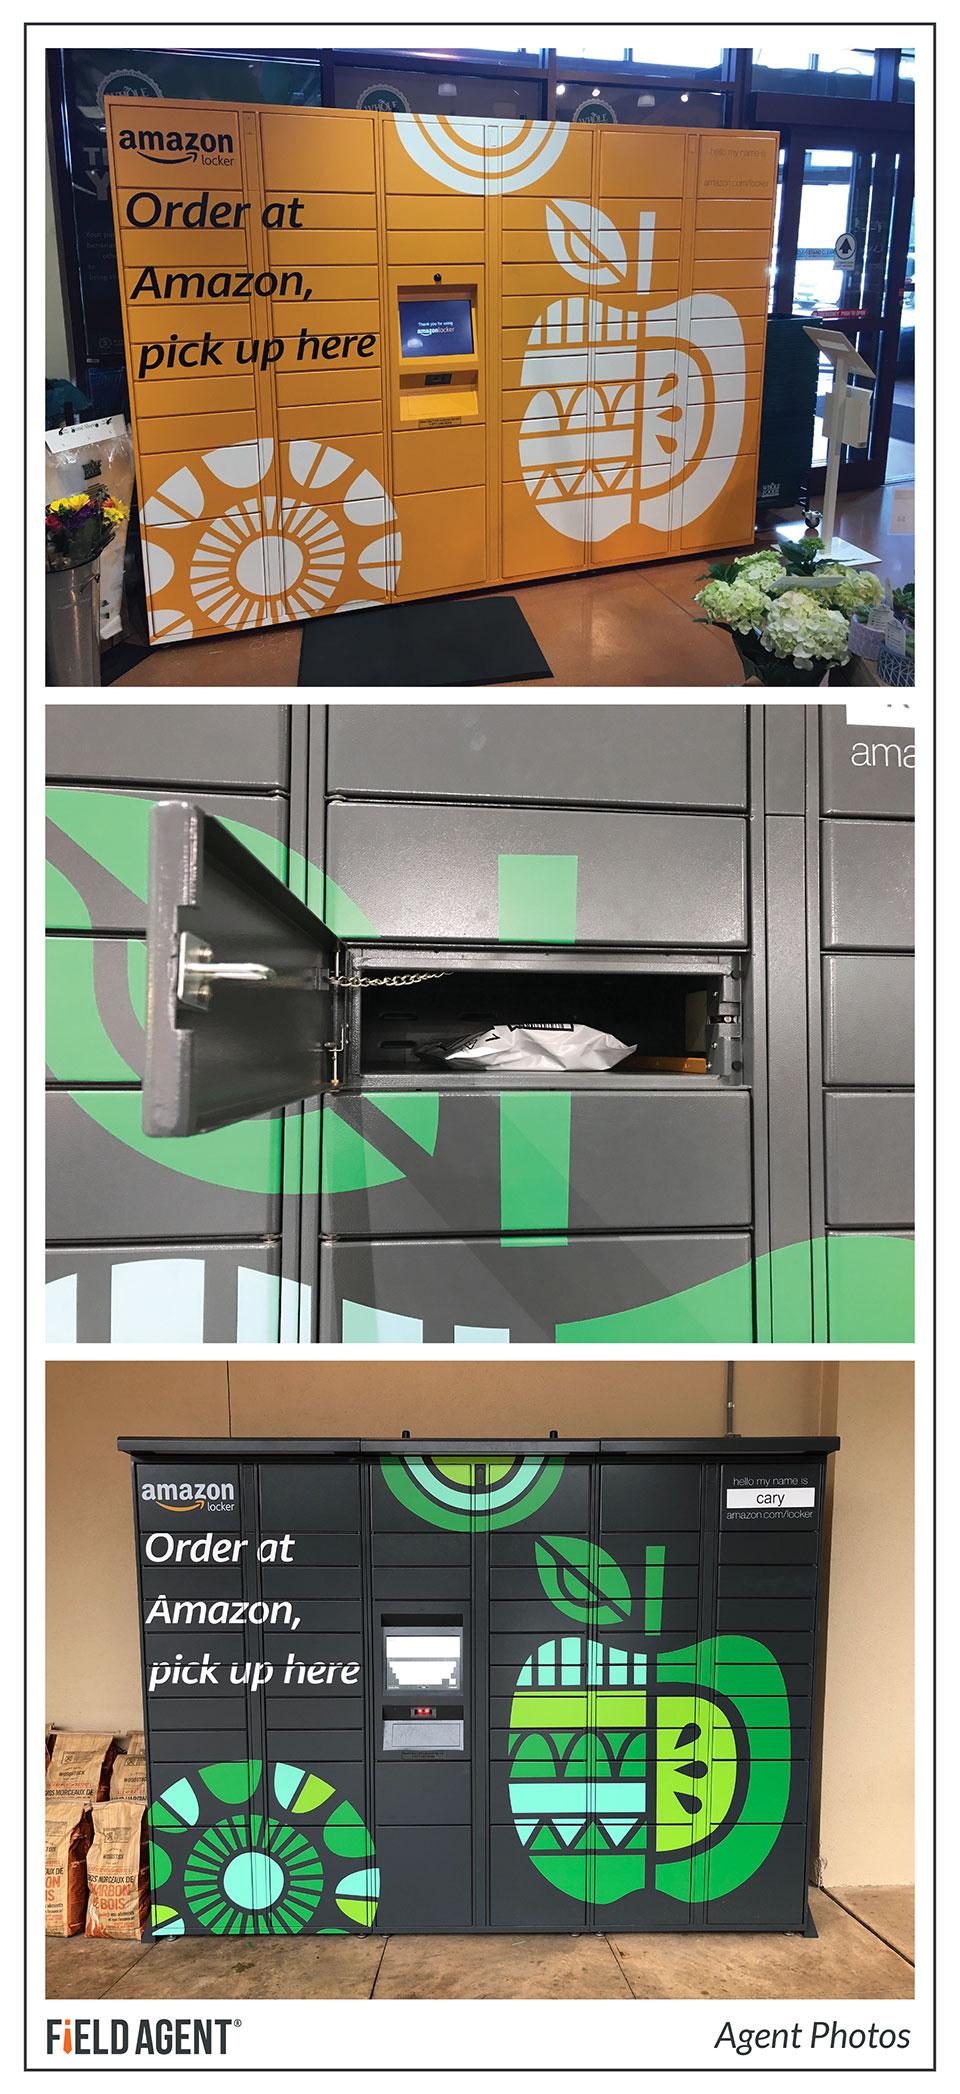 Photos - Amazon Locker at Whole Foods